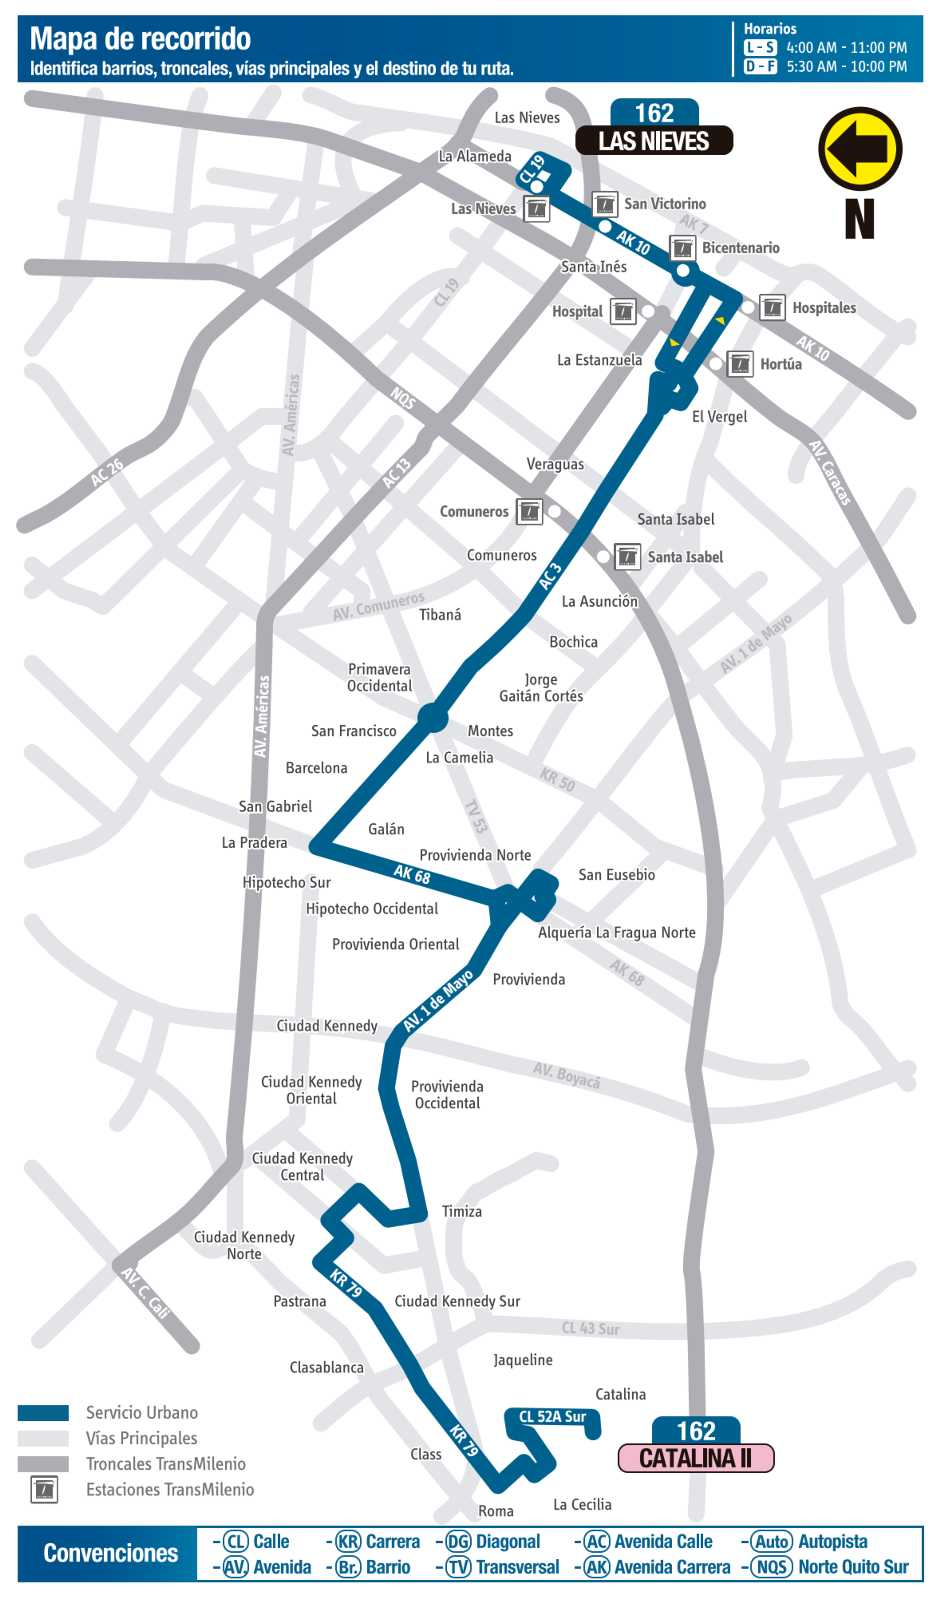 Ruta SITP: 162 Catalina II ↔ Las Nieves (mapa)